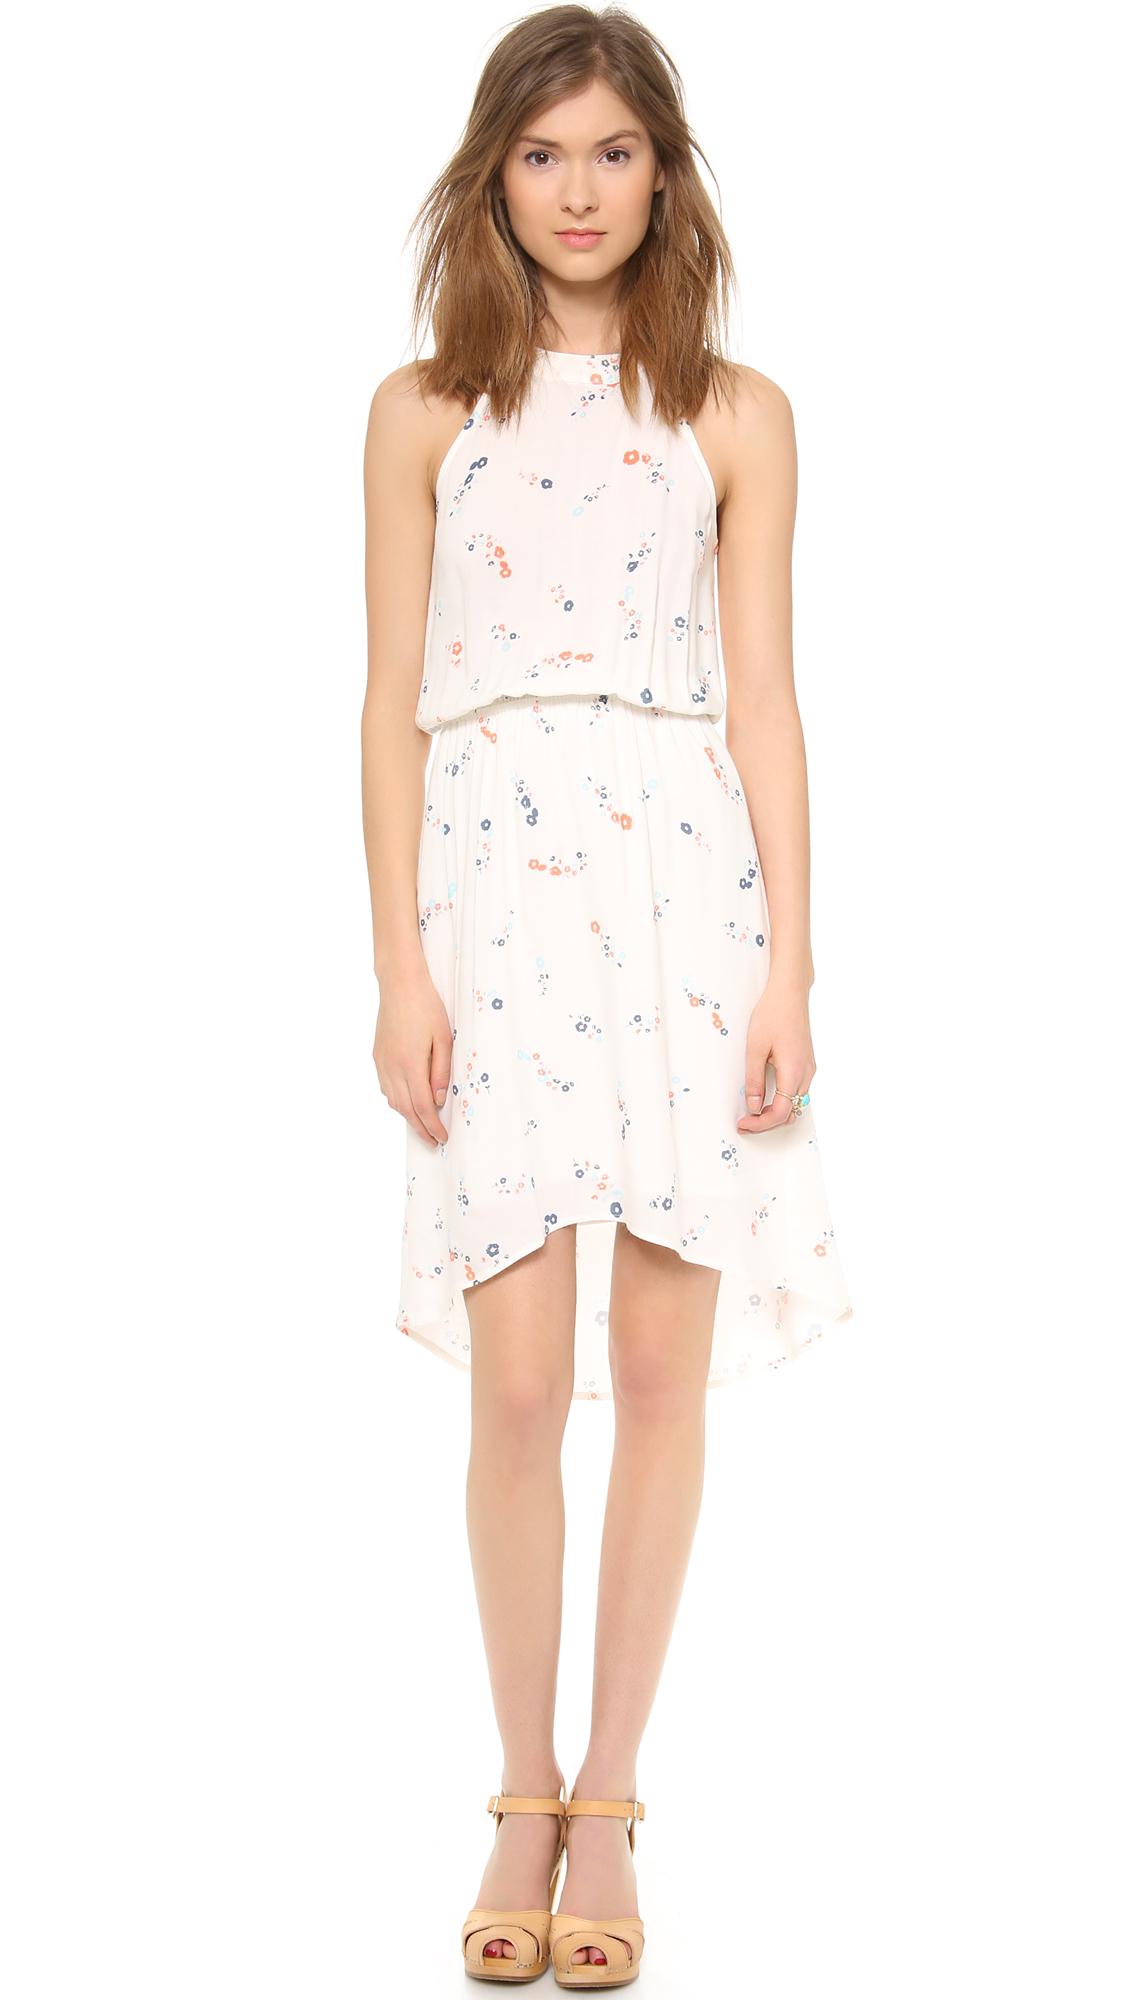 Splendid Printed Dress